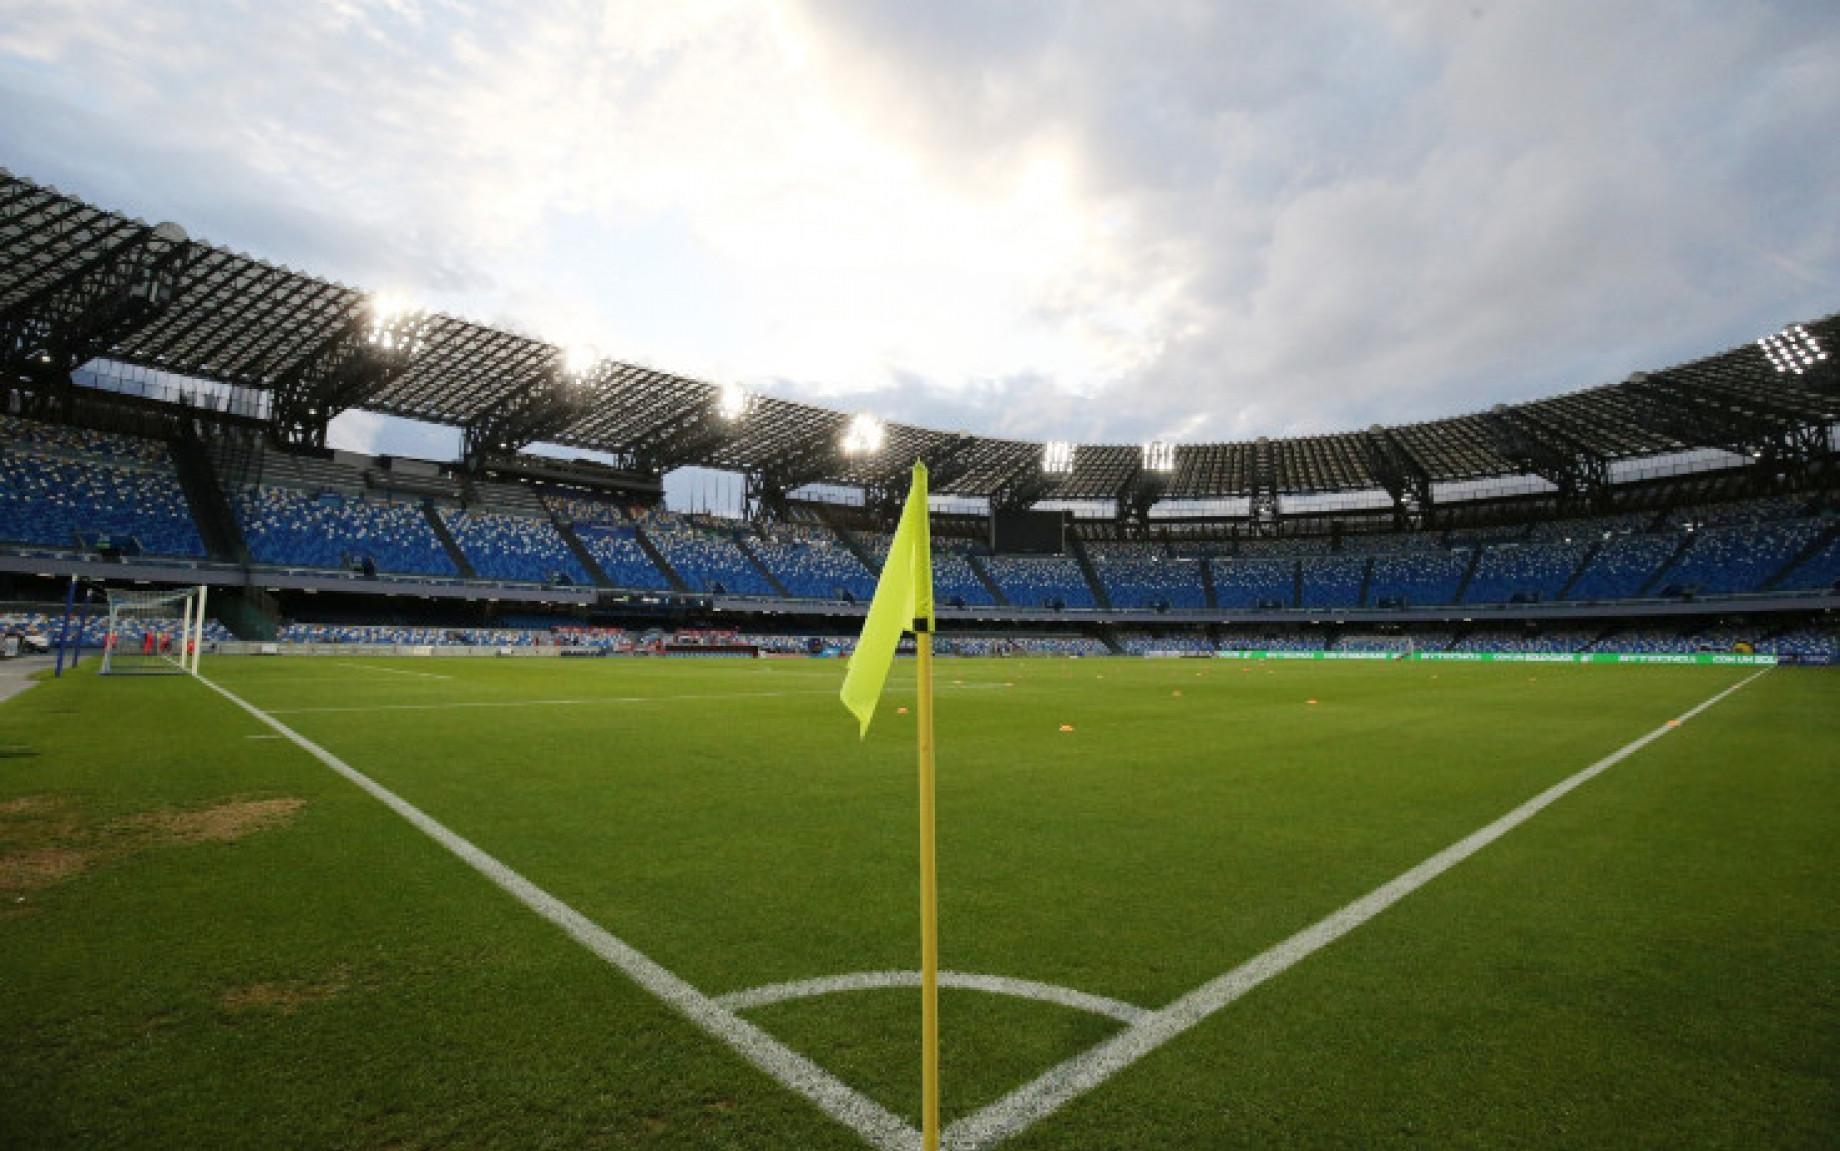 napoli_stadio_maradona_image_dimensions_ok.jpg